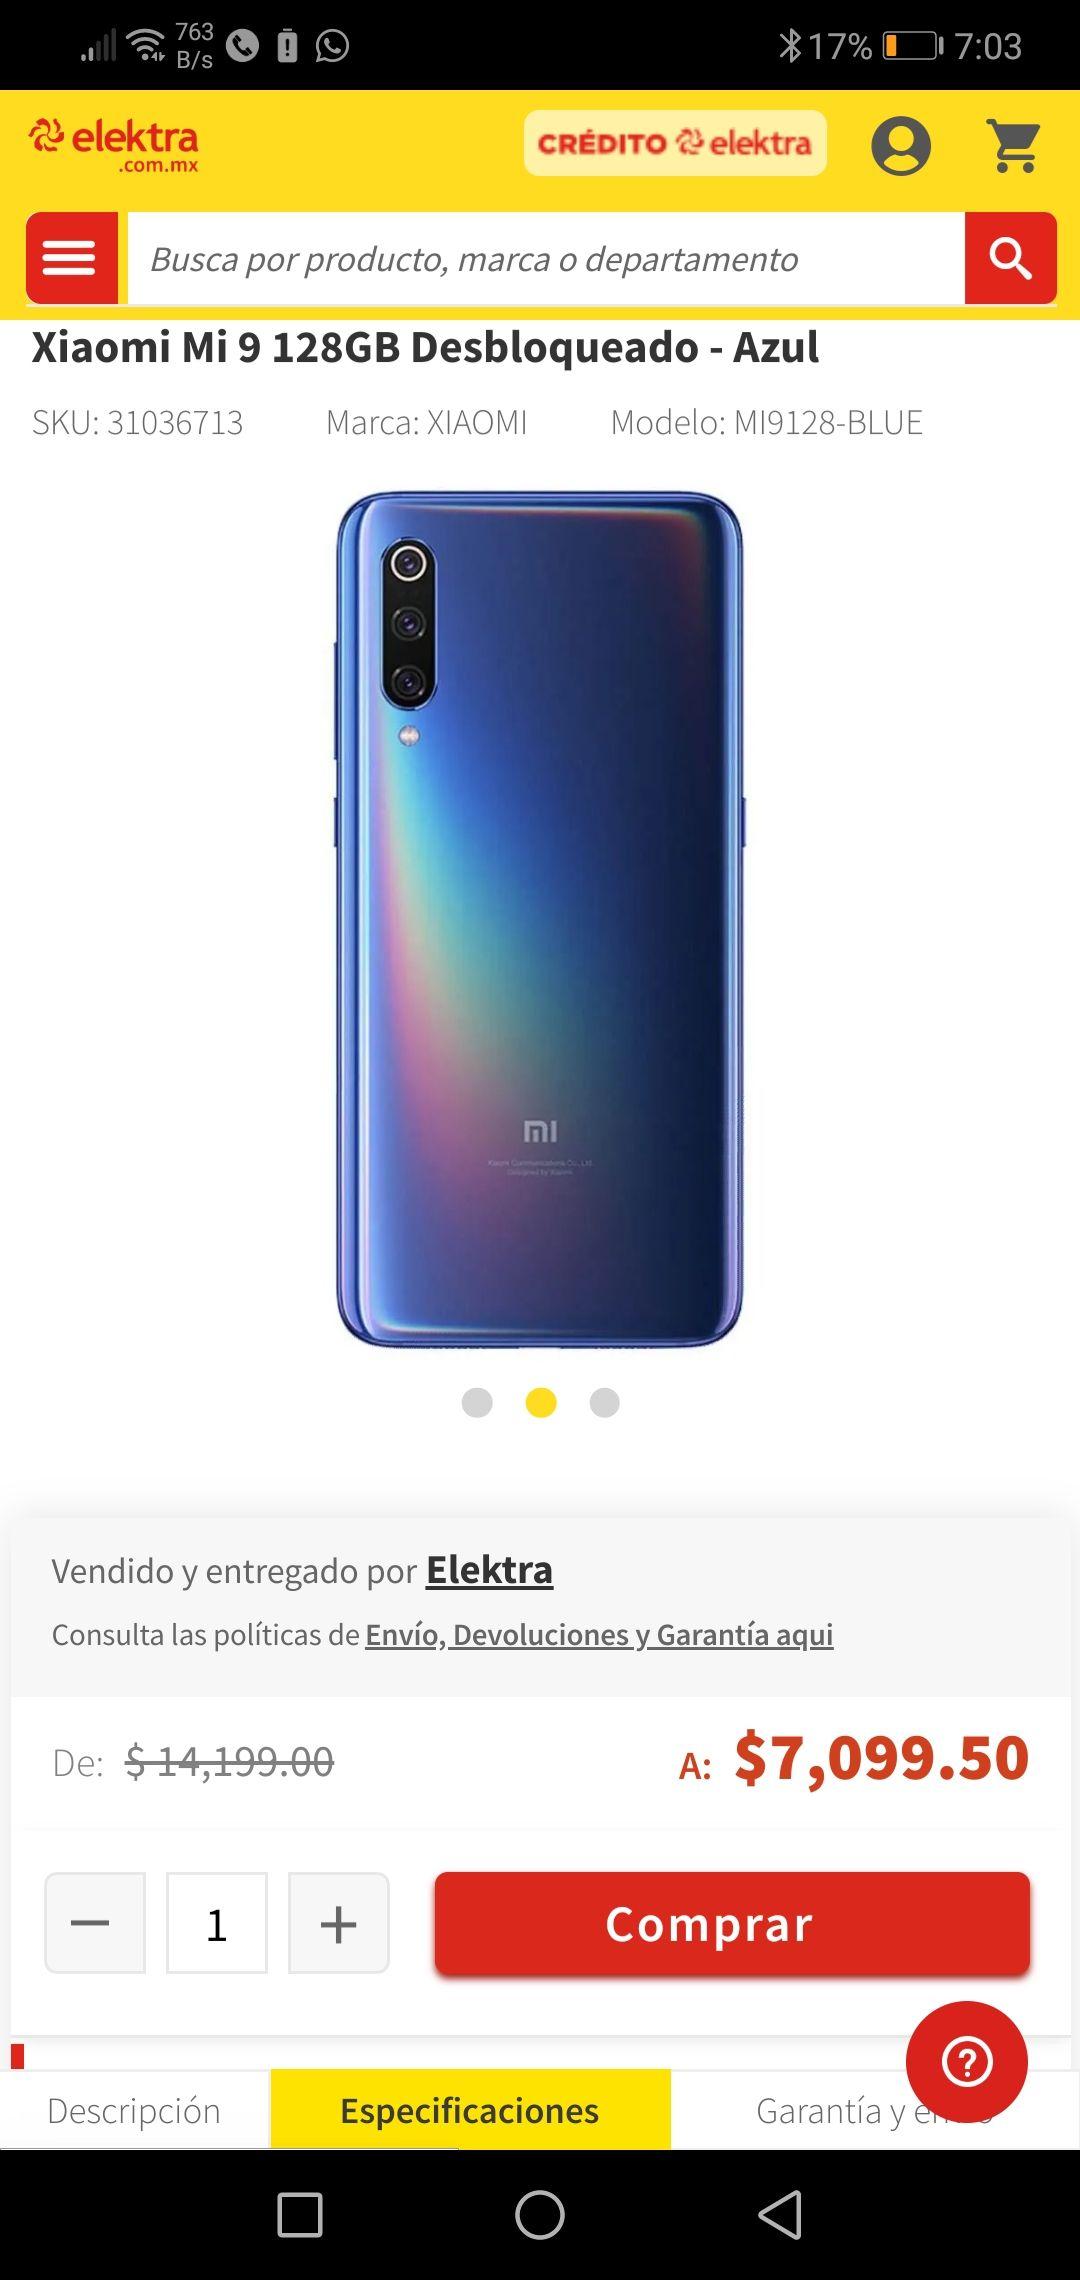 Elektra: Xiaomi Mi 9 128 Desbloqueo azul